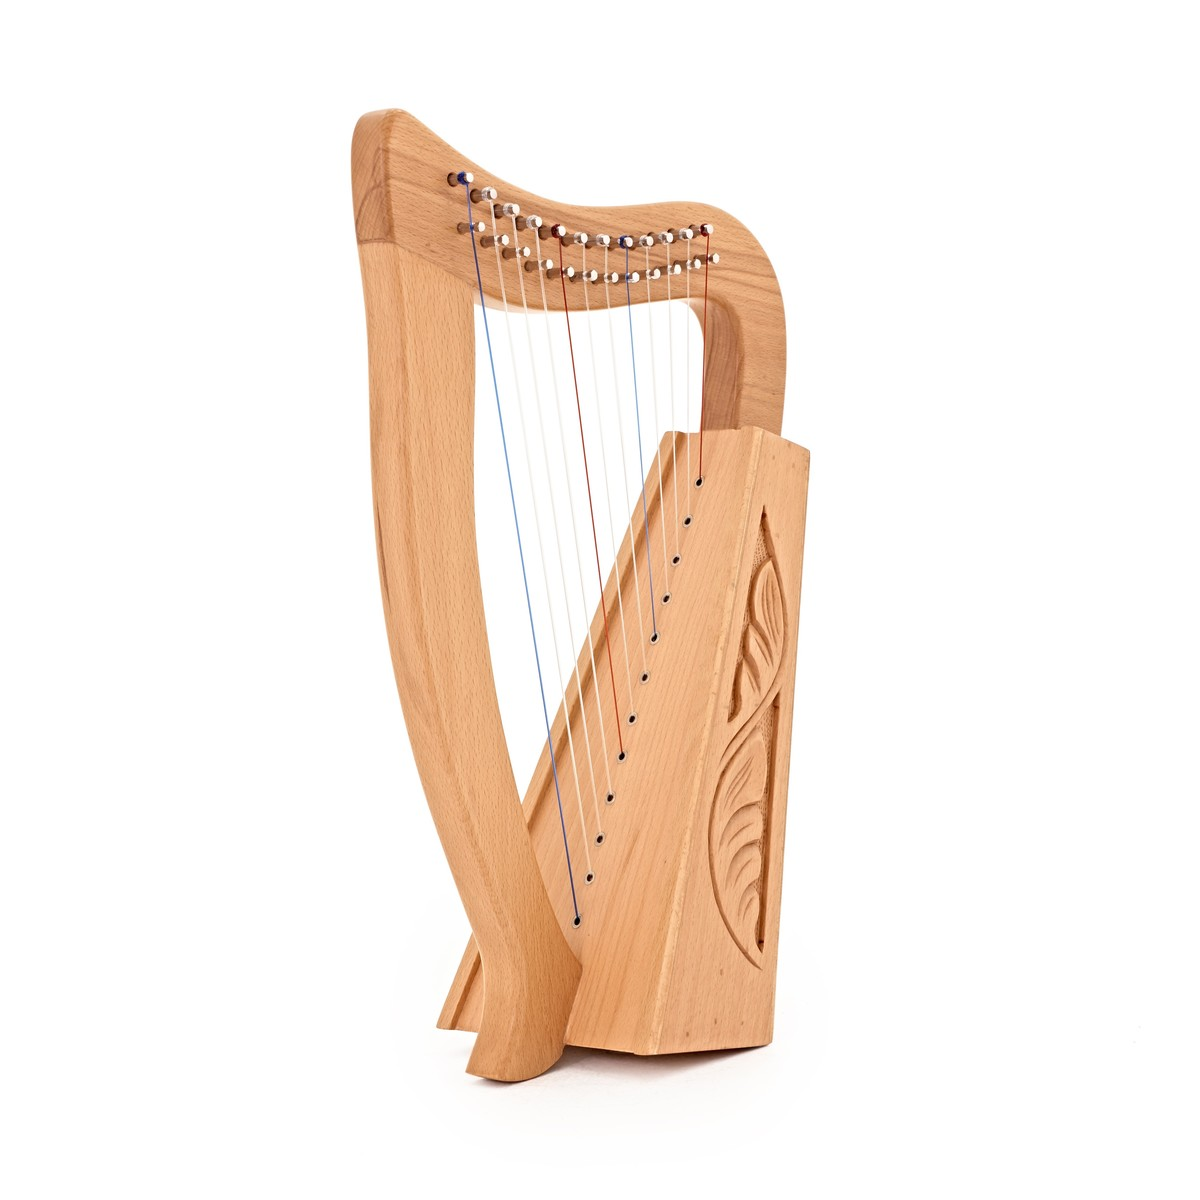 12 String Harp by Gear4music - B-Stock